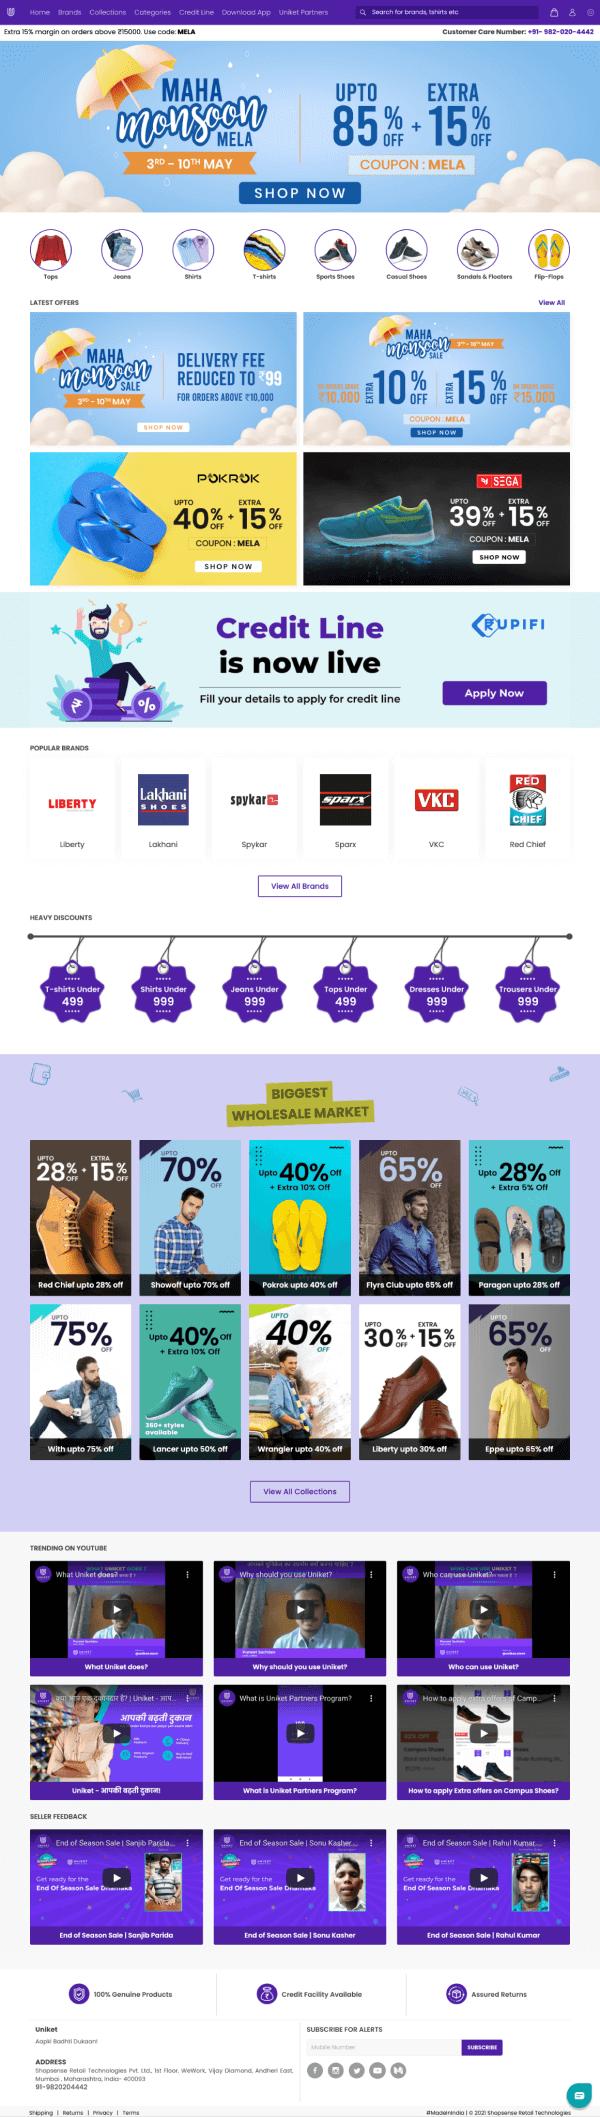 Uniket Store (Wholesaler Hub)